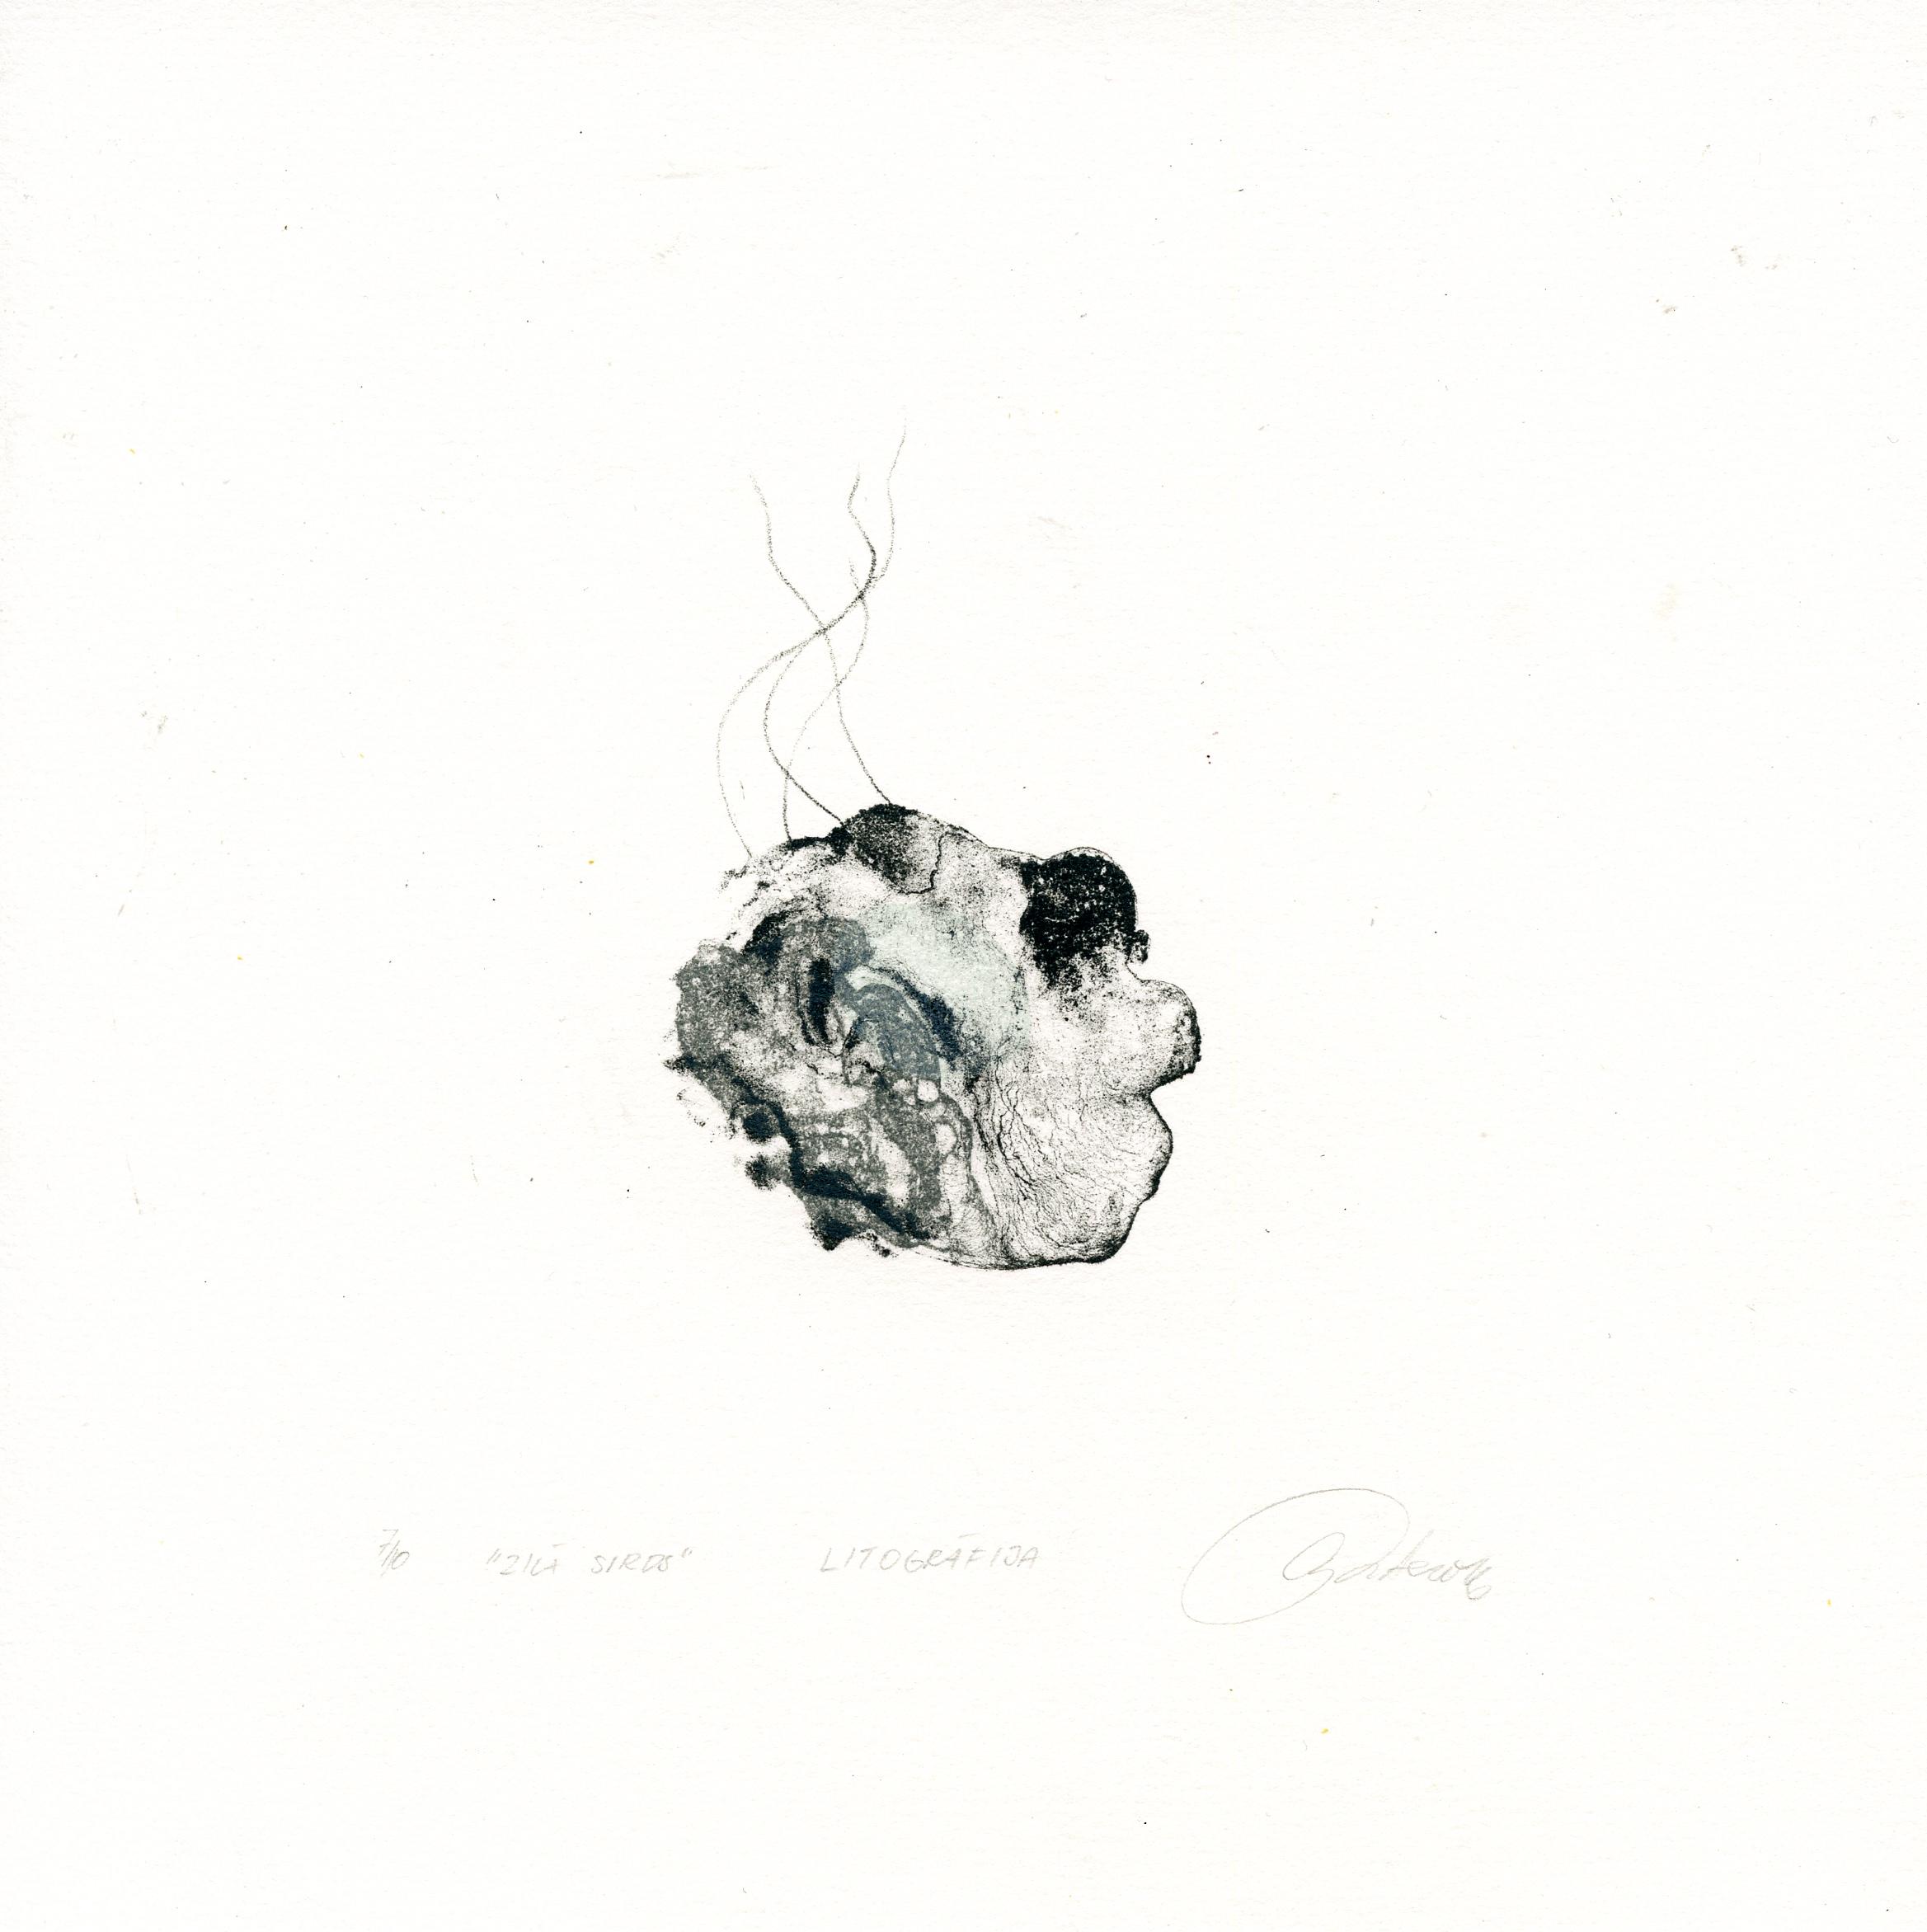 Smite, Ausma - The blue heart - Color lithography